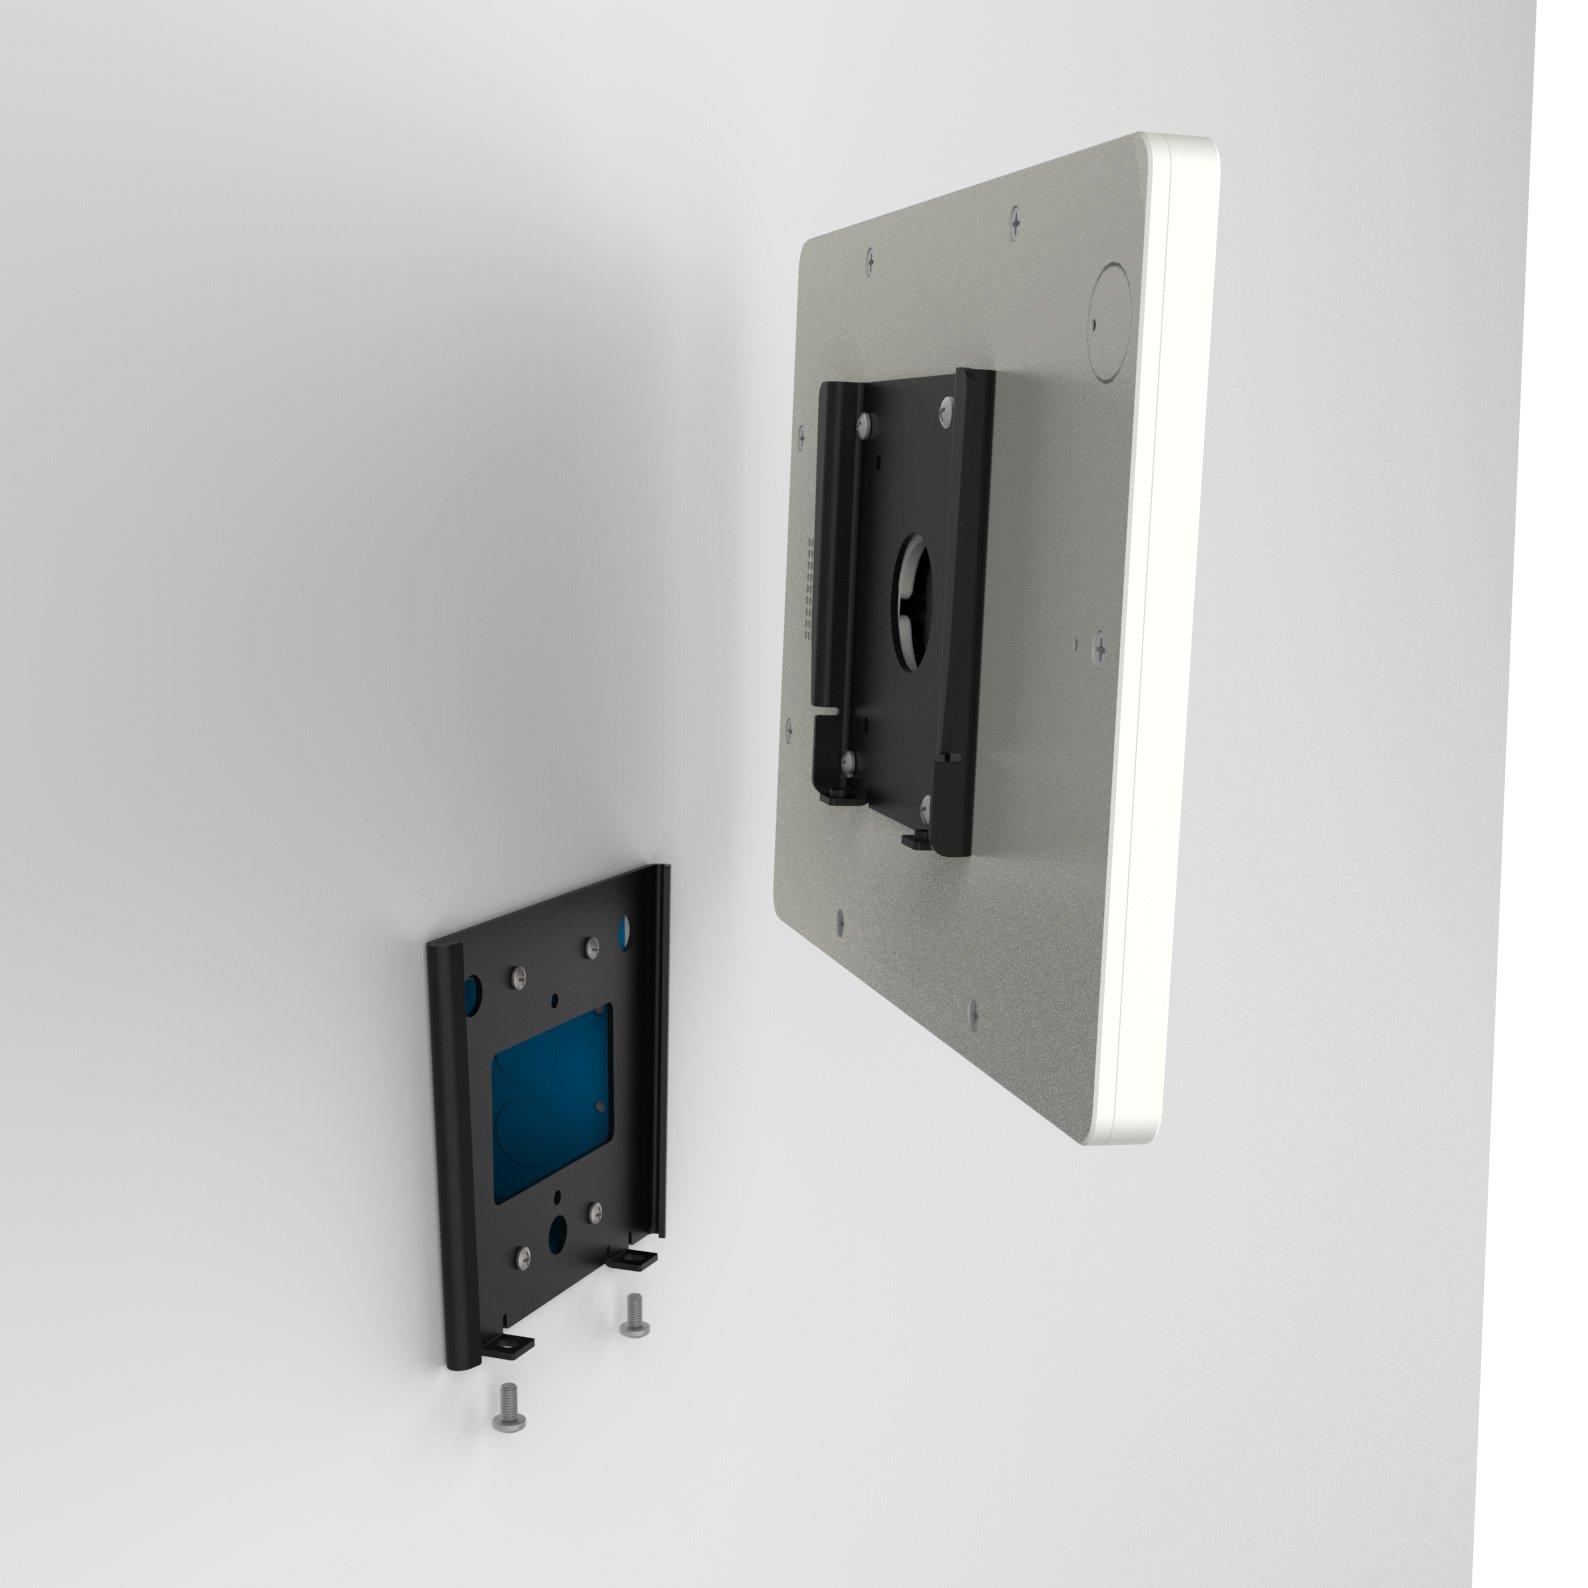 iPad (5th Gen) 9.7/Pro, Air 1/2 White Home Button Covered Fixed Slim VESA Wall Mount [Bundle] by VidaBox Kiosks (Image #5)